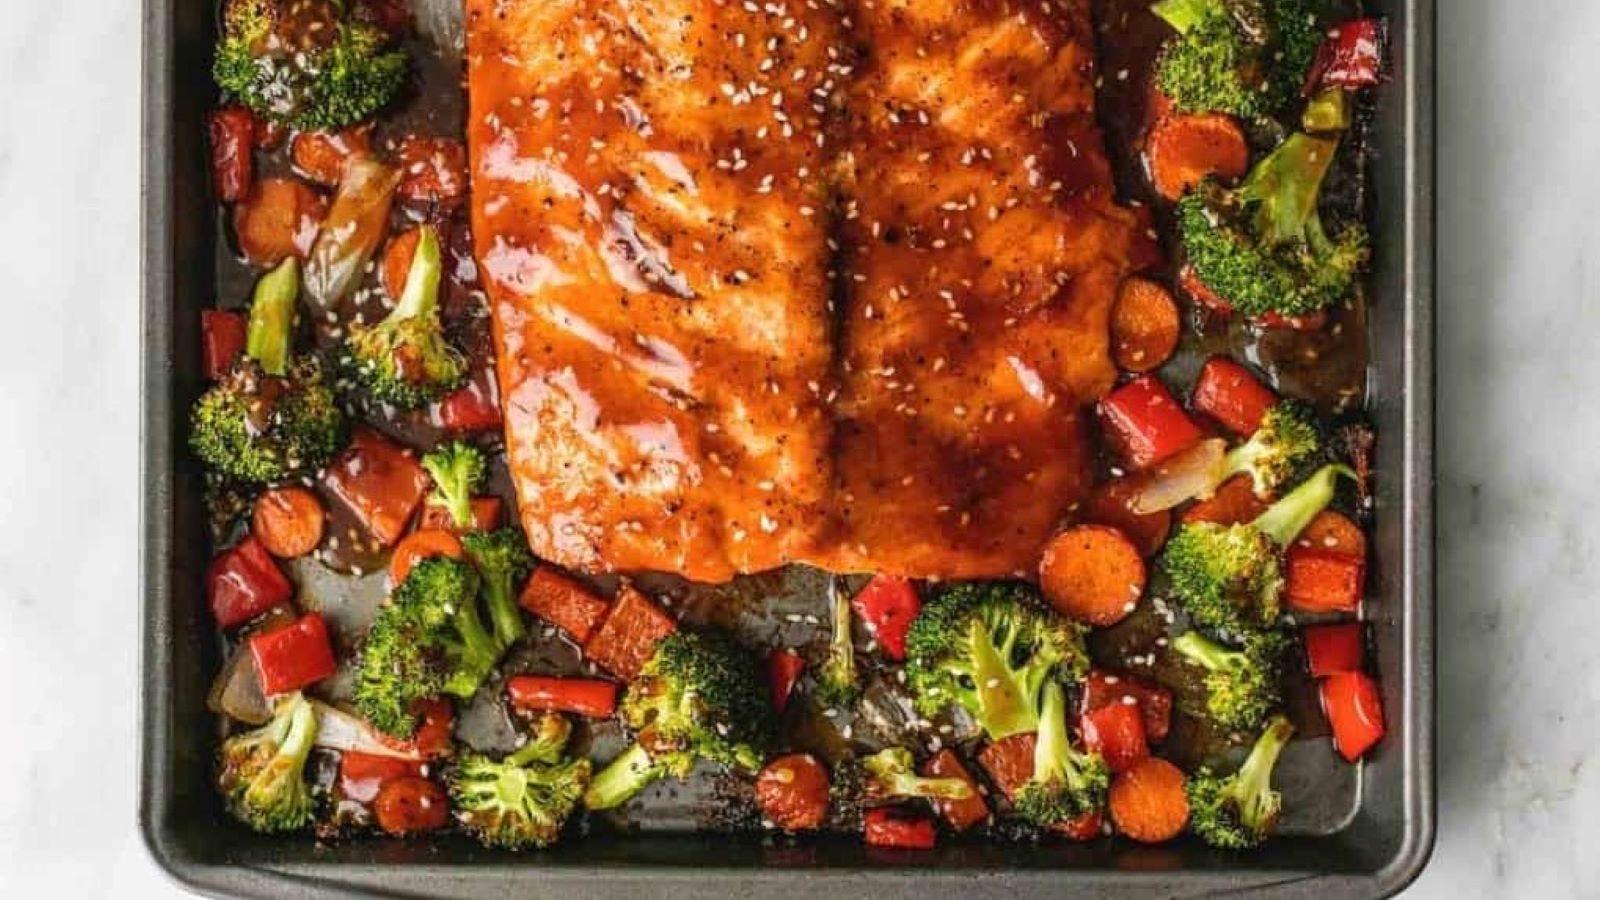 A sheet pan full of Teriyaki Salmon and Vegetables.